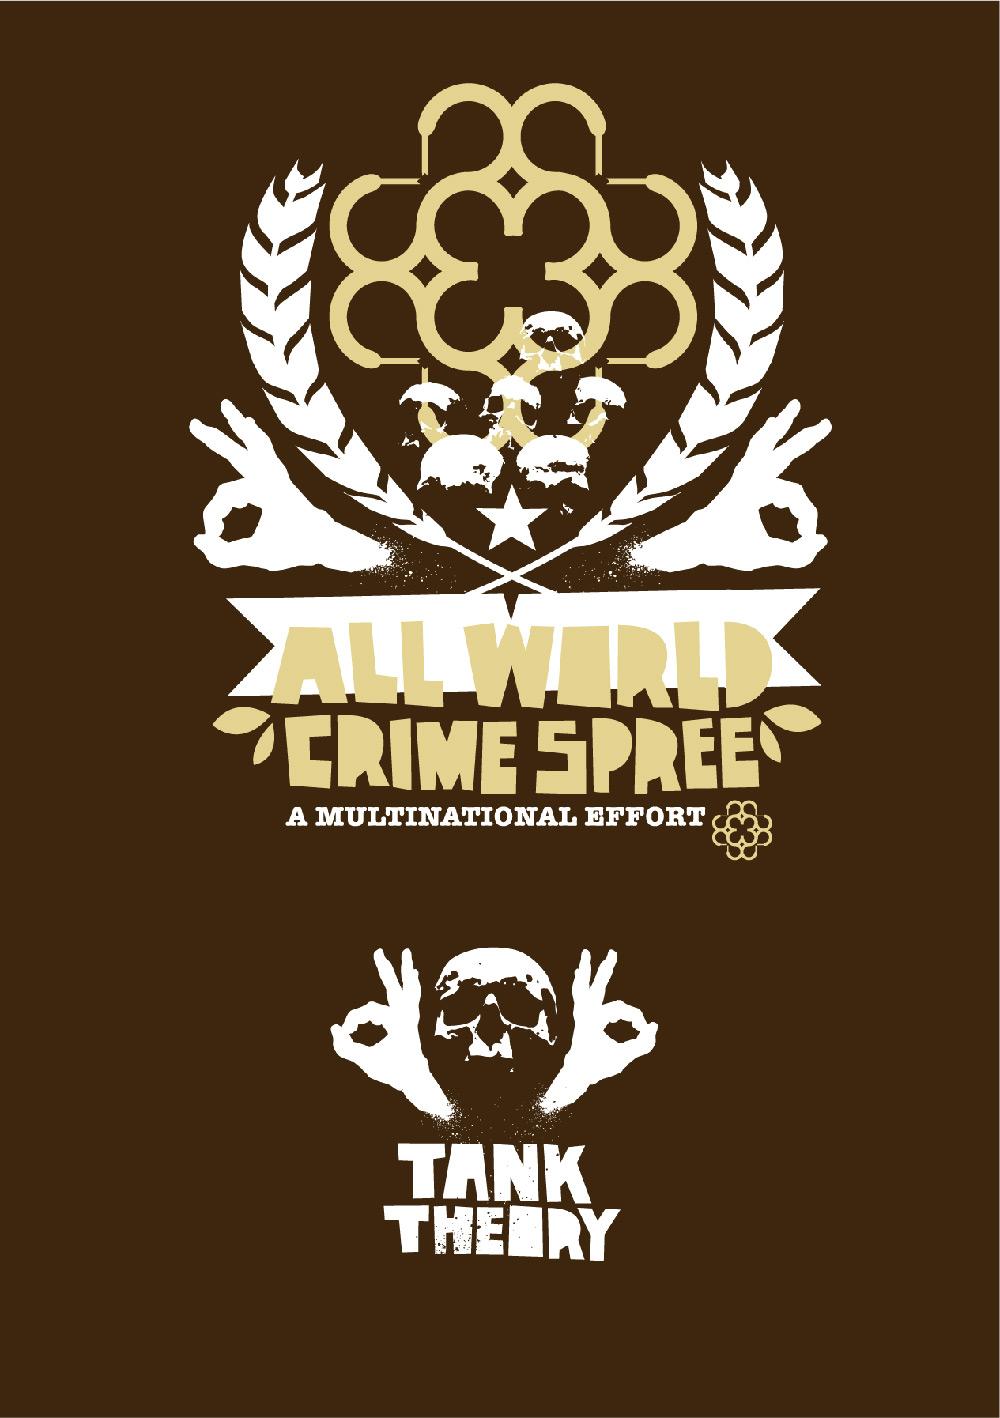 tank-theory26.jpg